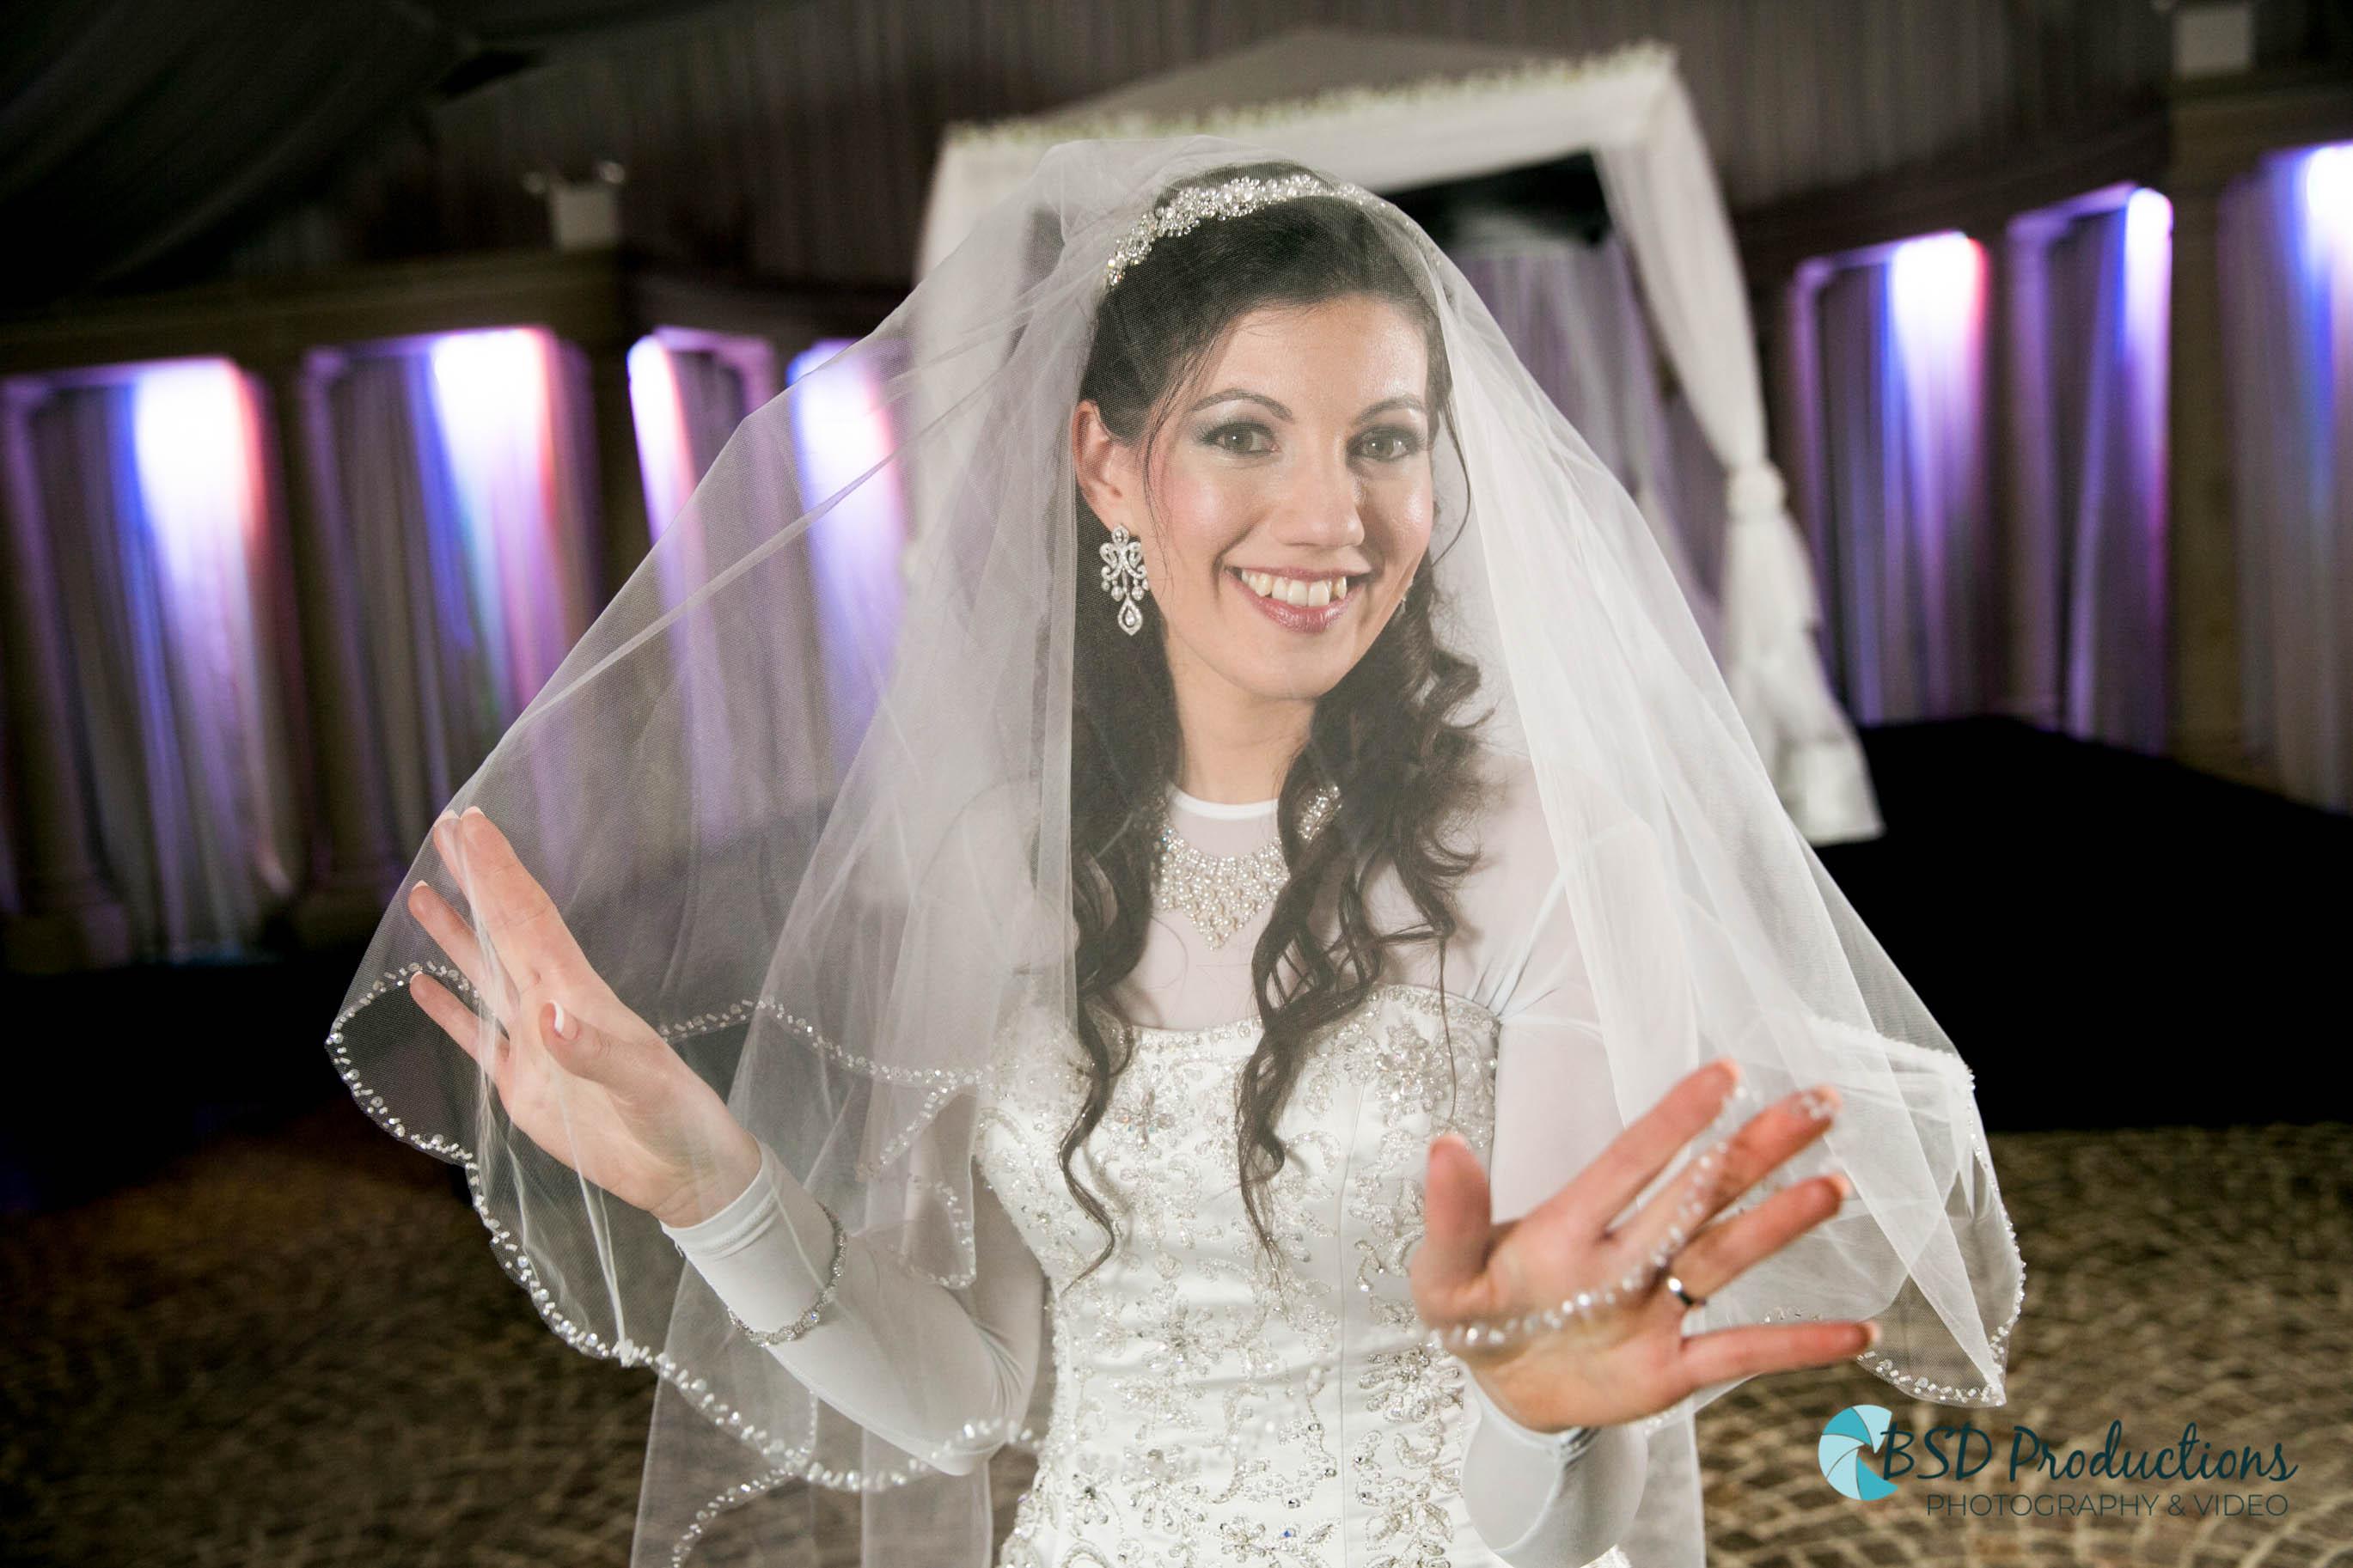 D_R_0173 Wedding – BSD Productions Photography